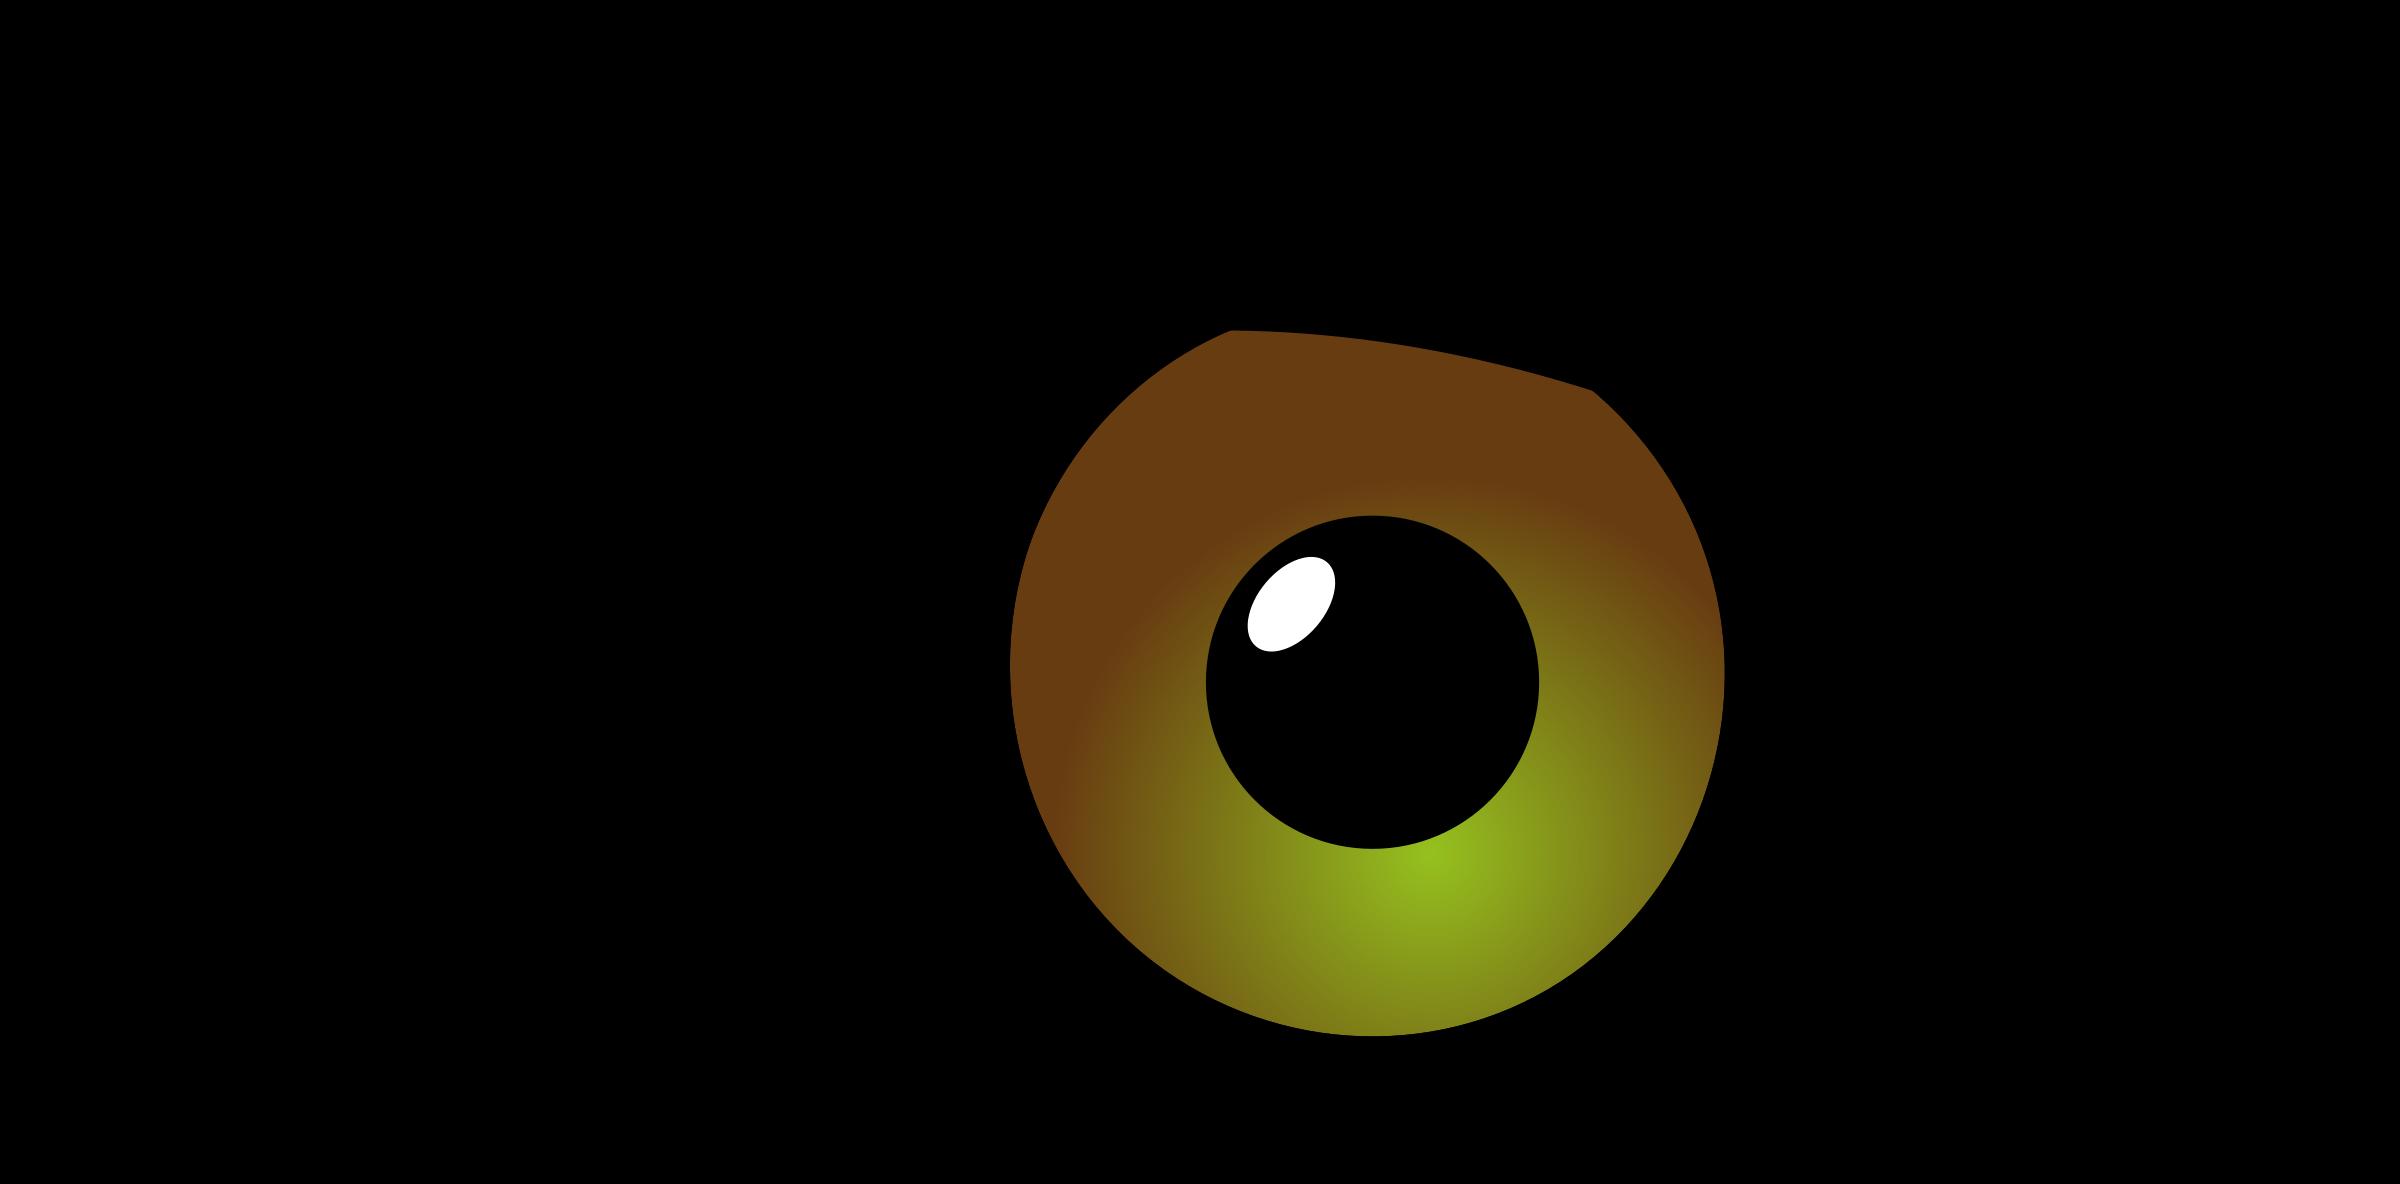 Number 1 clipart eye. Big image png